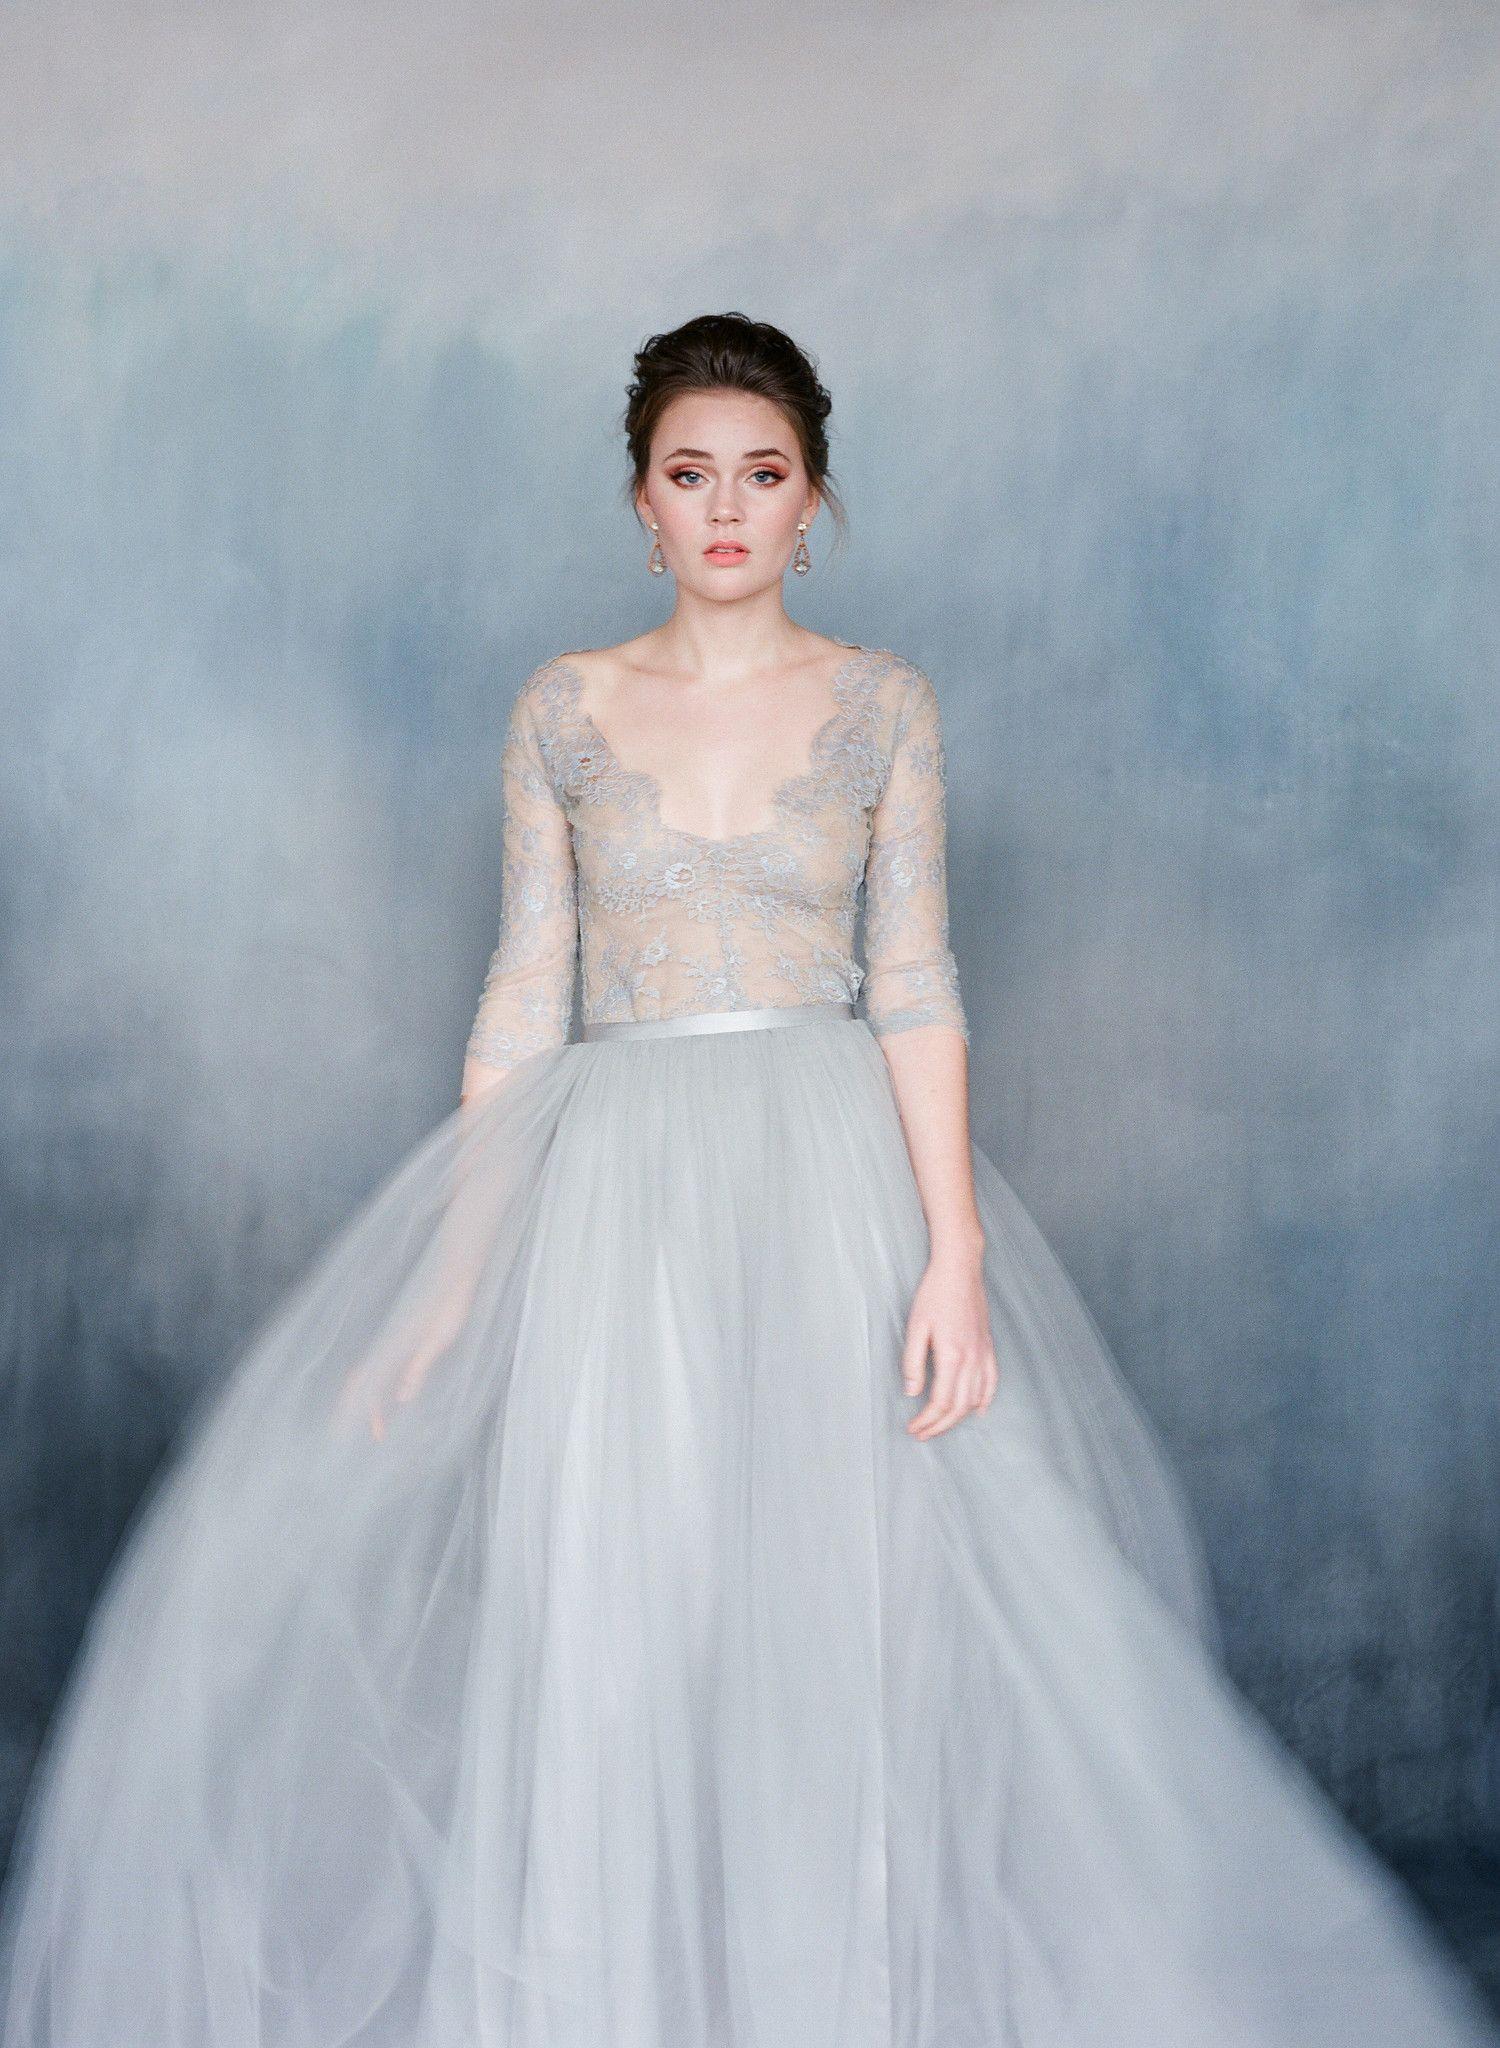 Nightingale | Nightingale, Wedding dress princess and Blue wedding ...